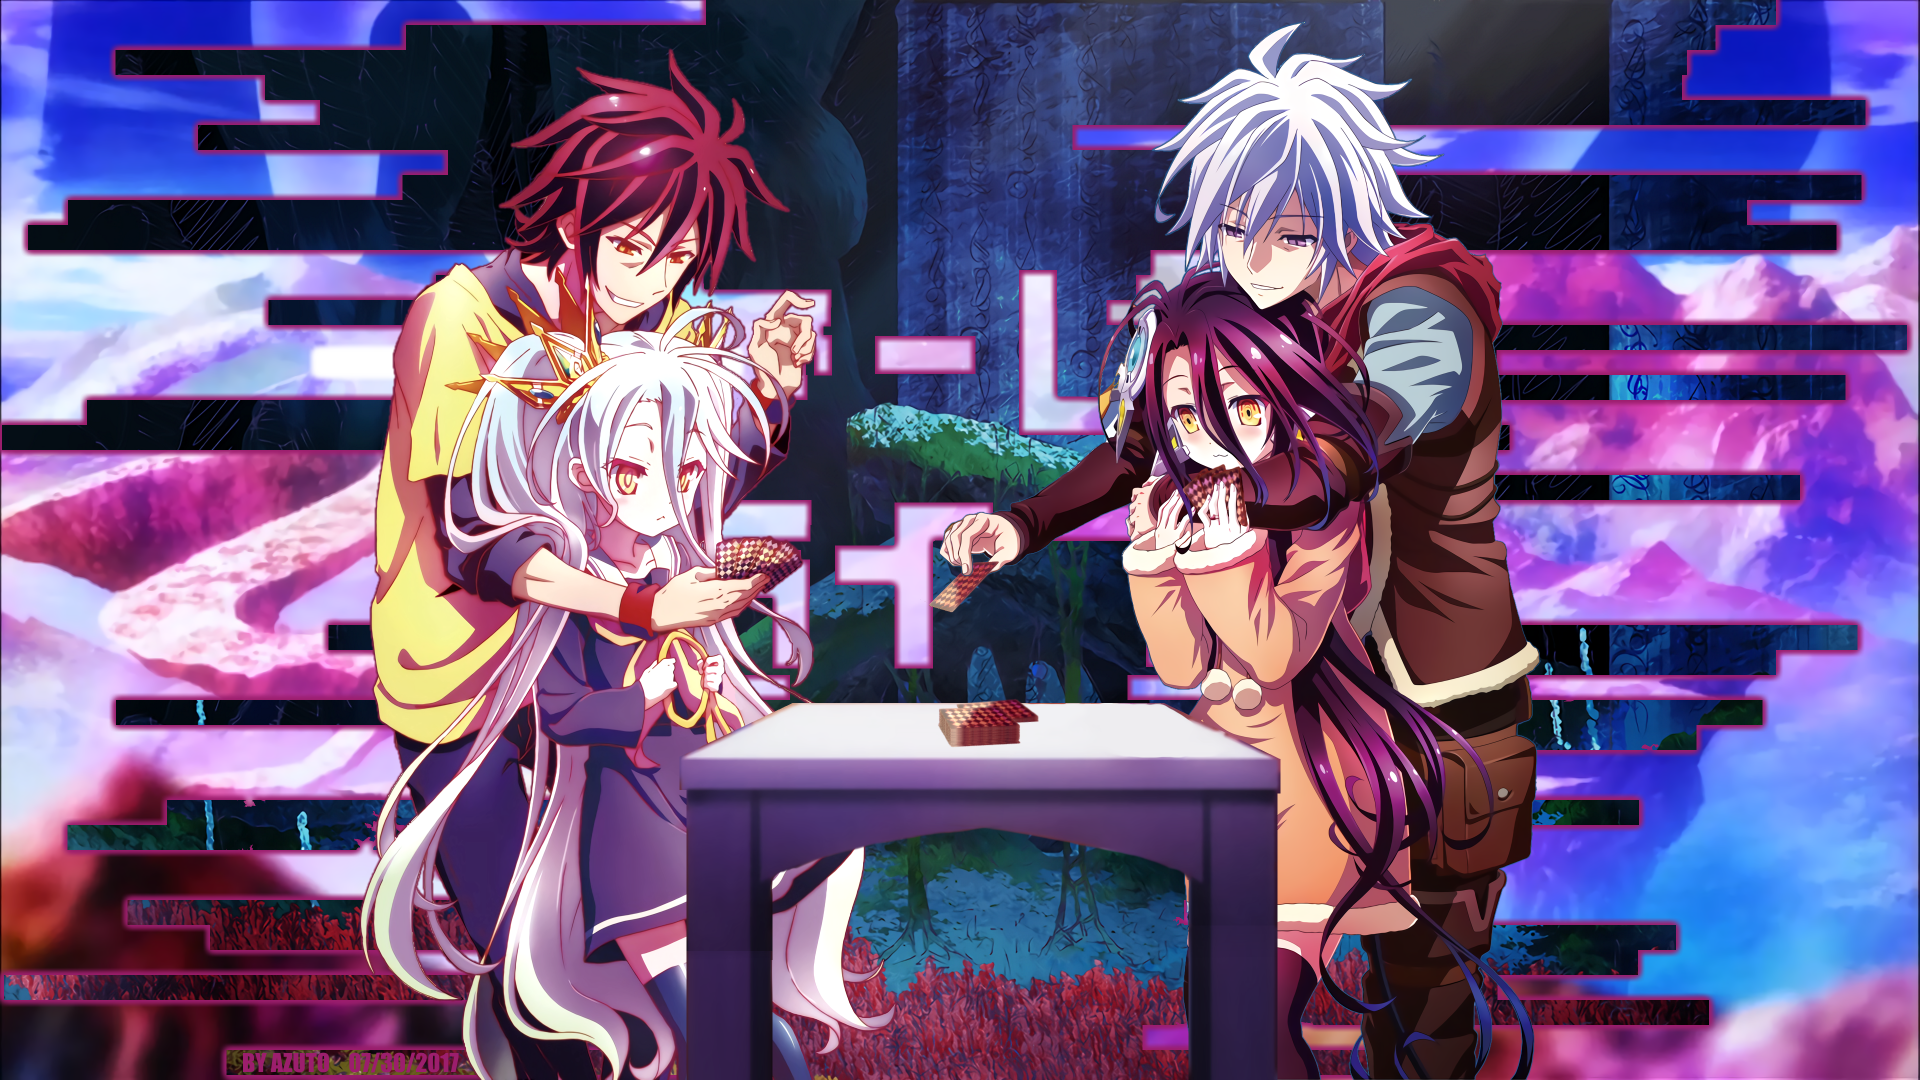 Epingle Par Alex Sur Anime Art The Game Of Life Anime Mangas Figurine Manga